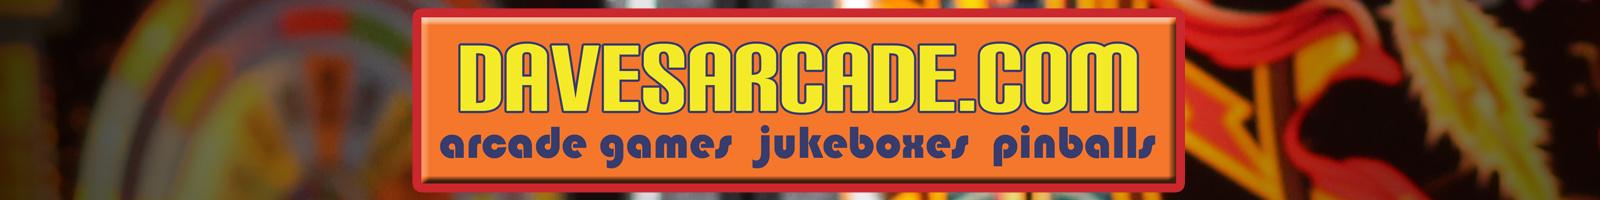 davesarcade.com header arcade games, jukeboxes, pinballs